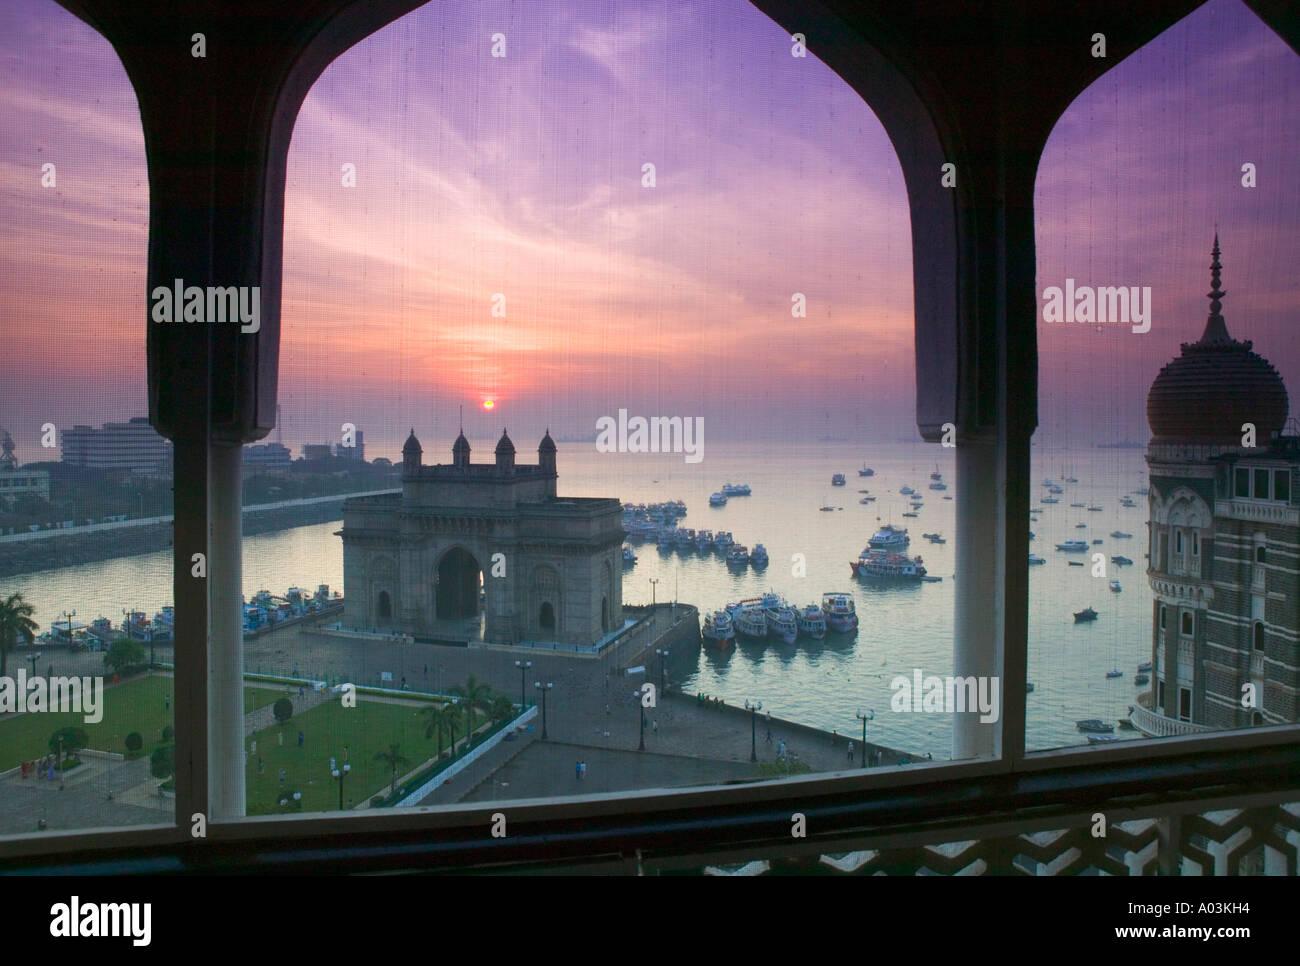 Gateway of India, Mumbai (Bombay), India Immagini Stock